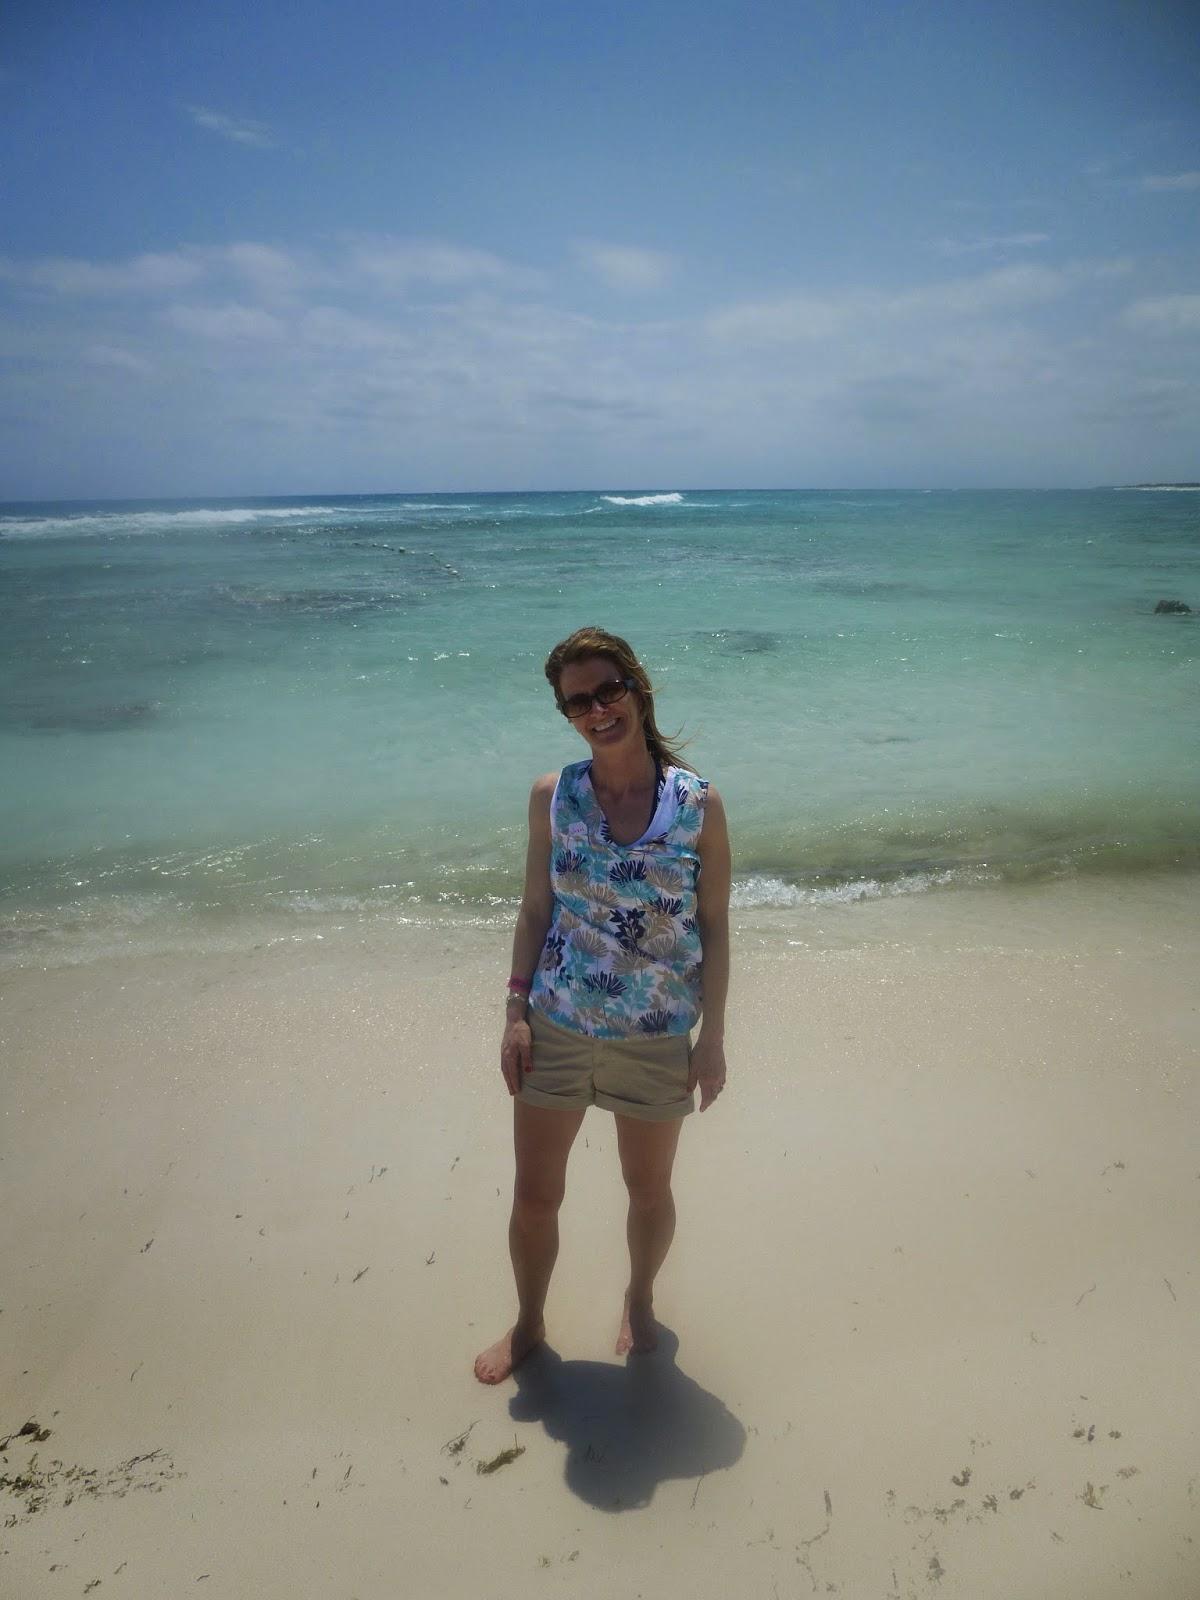 S.S. Beachbody success club trip, vacation, Live well, free trip, incentives, beachbody coaching